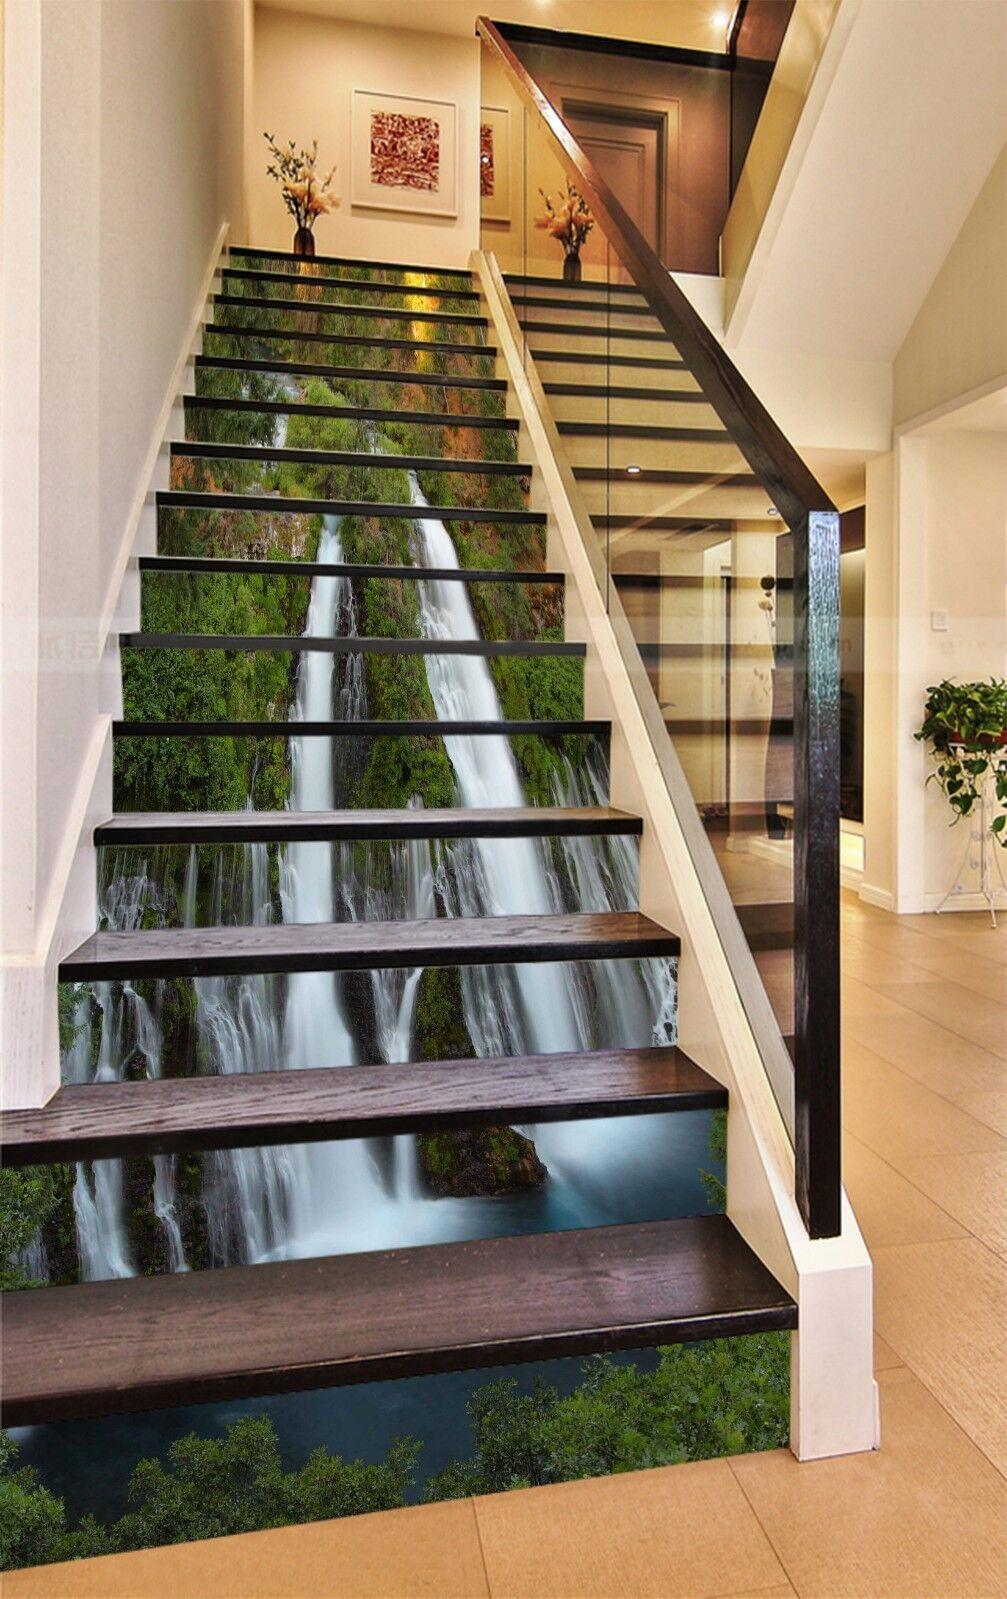 3D Wasserfall 2181 Stair Risers Dekoration Fototapete Vinyl Aufkleber Tapete DE